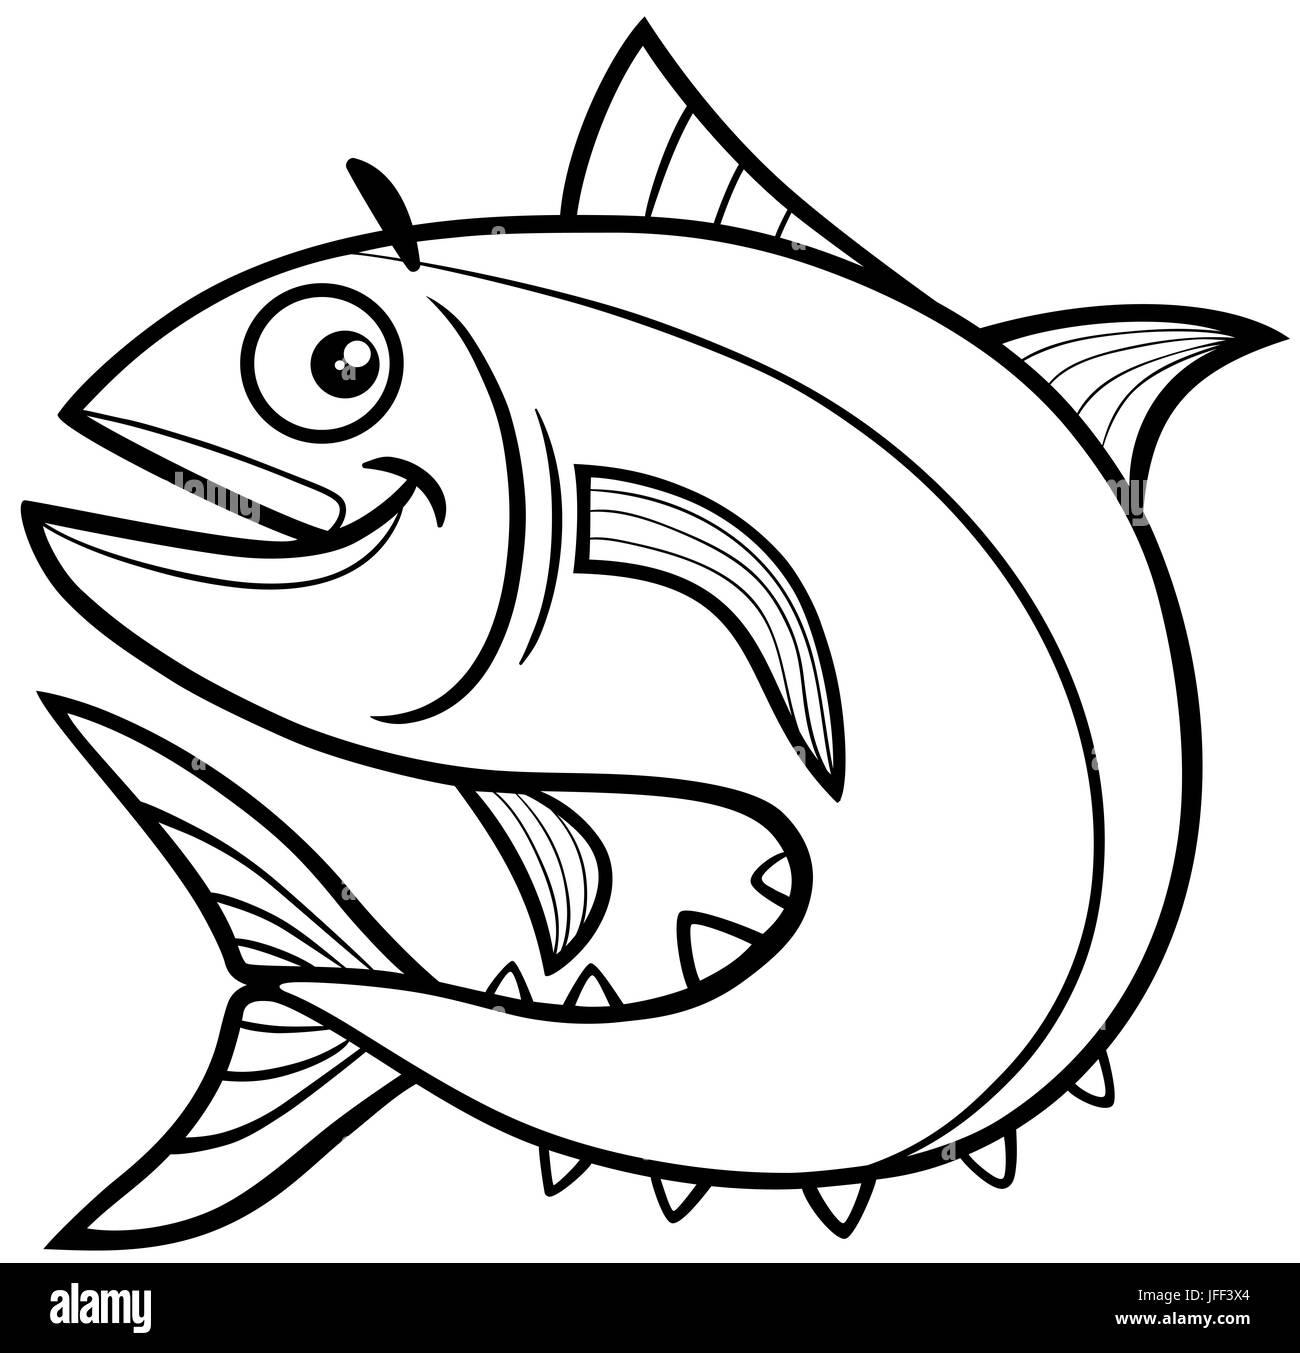 Tuna Fish Coloring Page Stock Photo Royalty Free Image 147235148